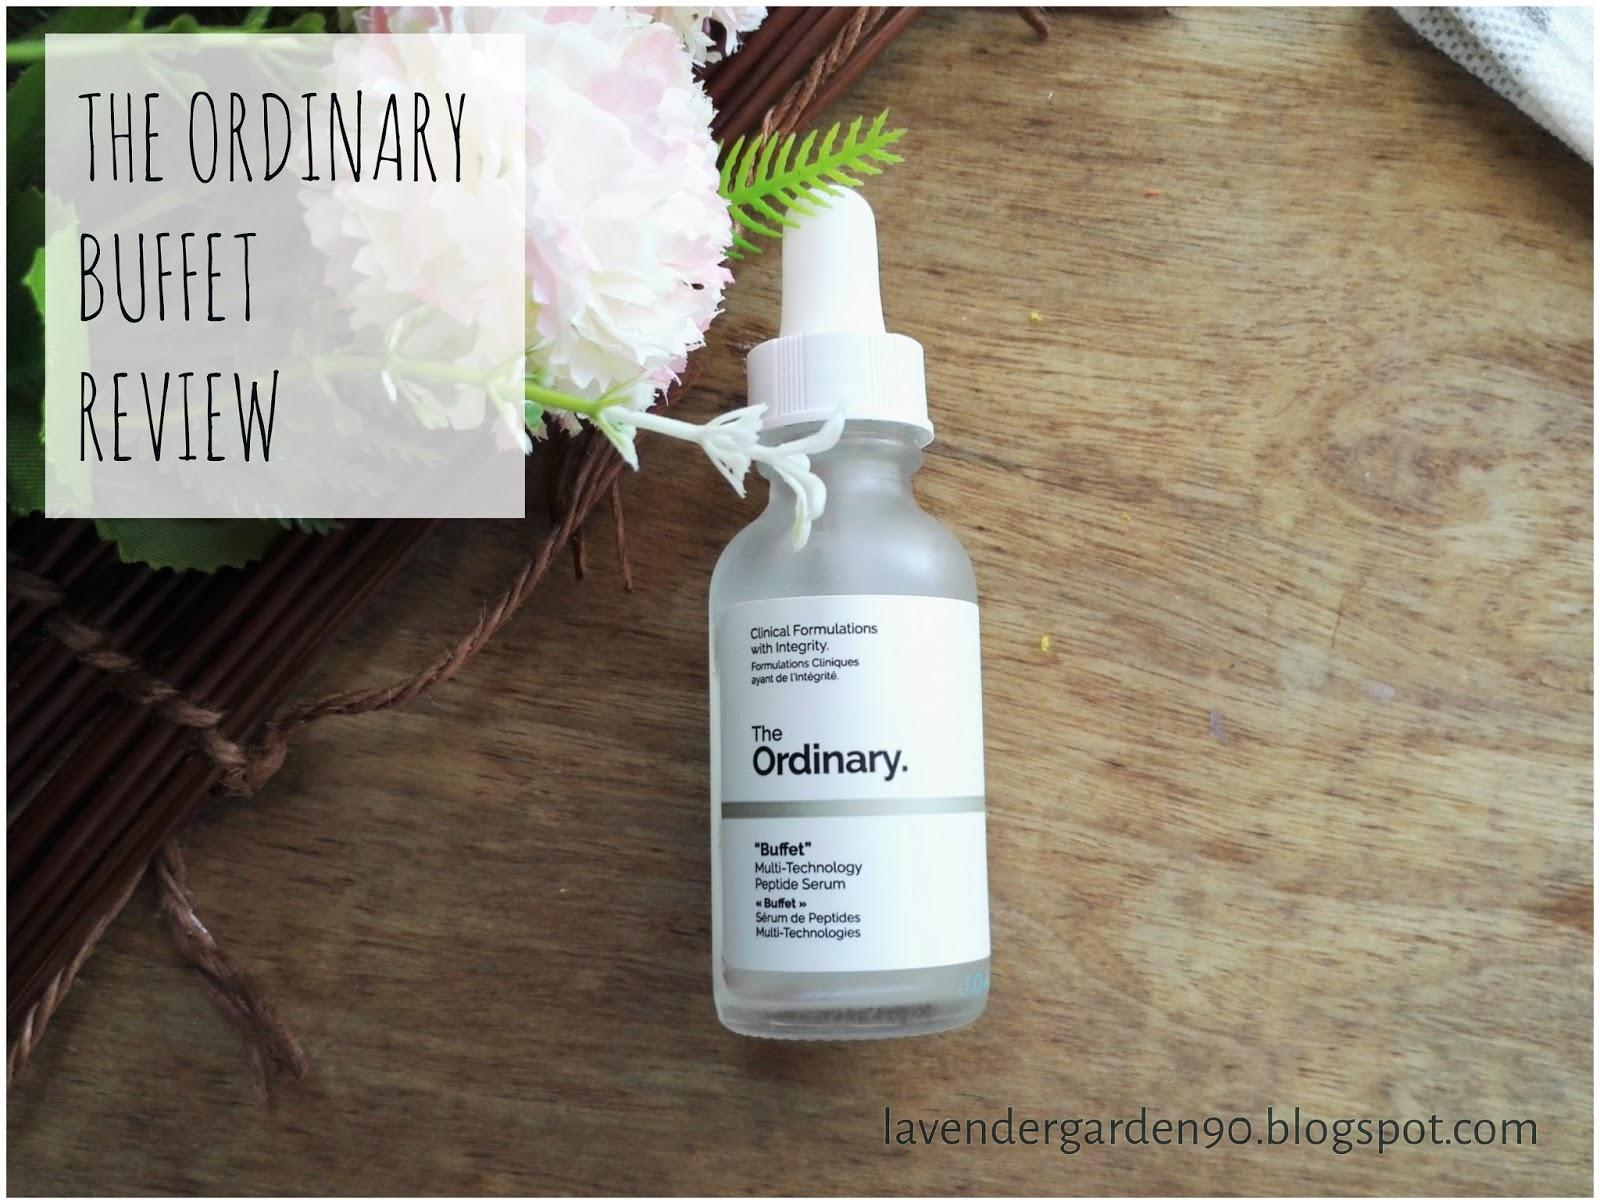 Carolyn S Lavender Garden Review The Ordinary Buffet